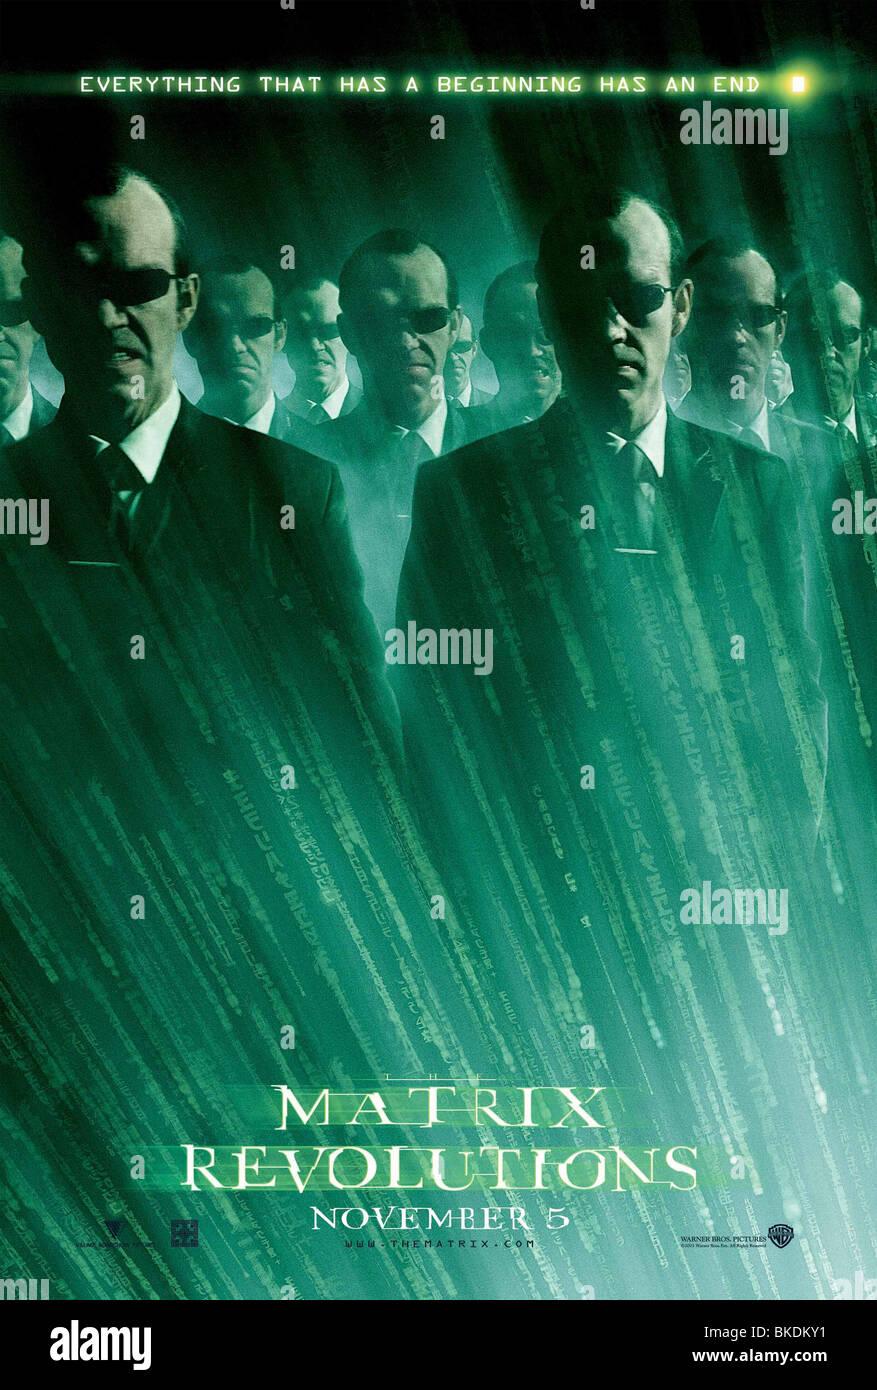 THE MATRIX REVOLUTIONS (2003) THE MATRIX 3 (ALT) POSTER MTX3 002-P1 - Stock Image